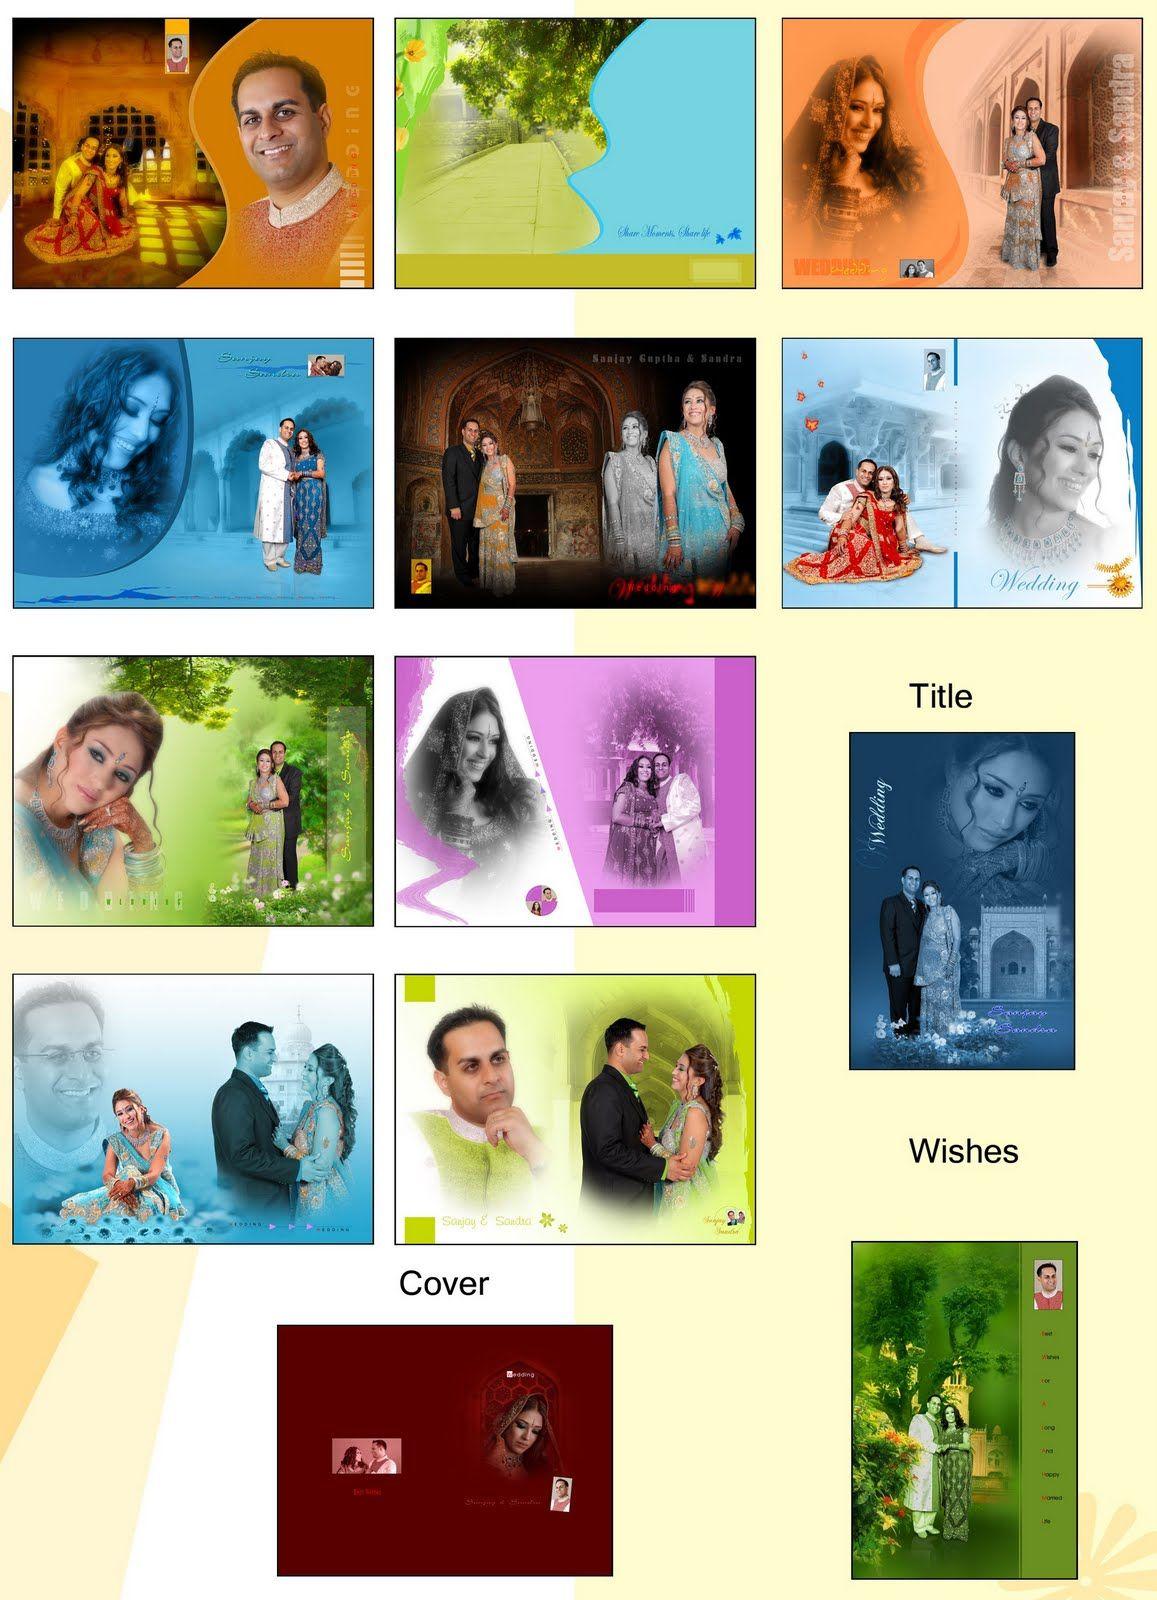 Indian Wedding Album Psd Templates Free Download Album Design Wedding Album Design Wedding Album Templates